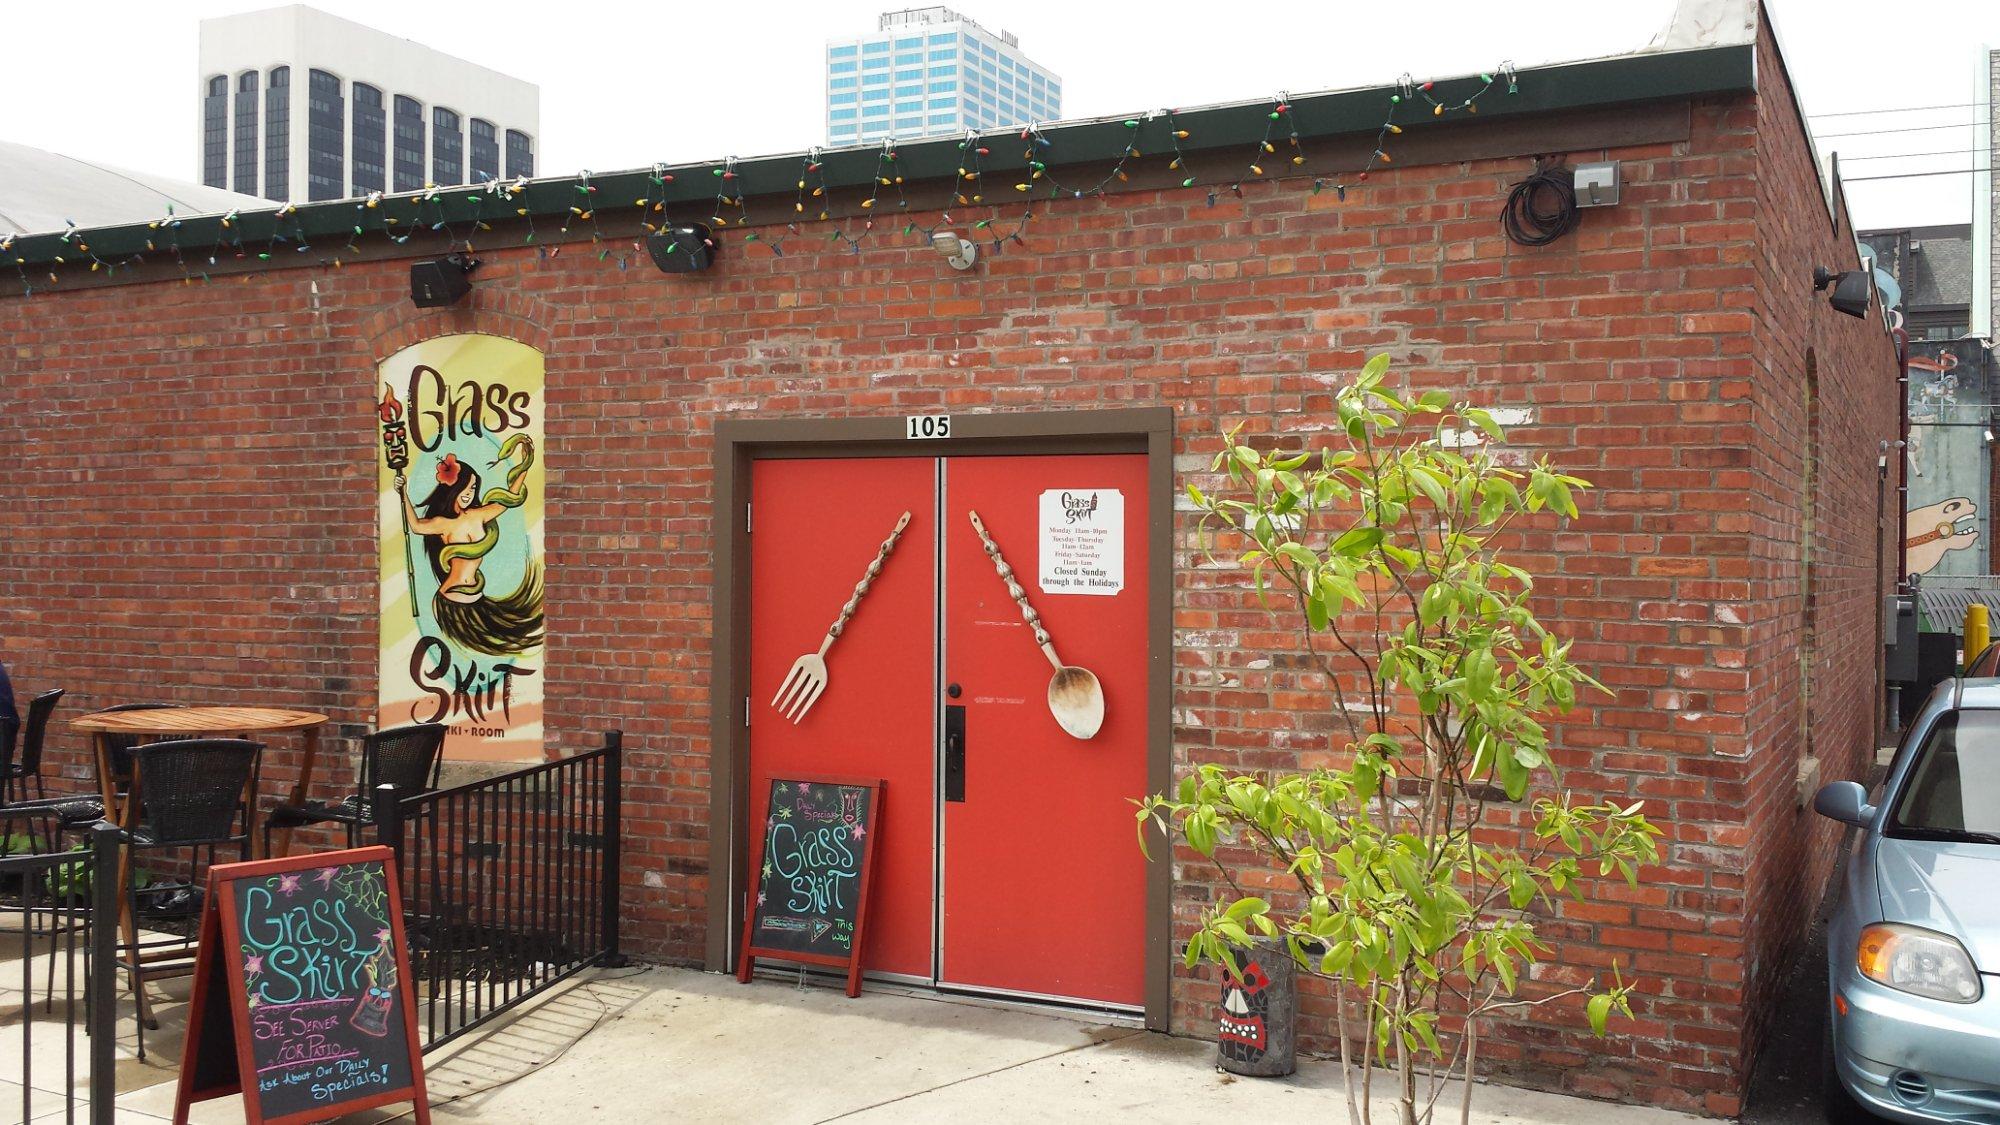 Best Tiki Bar And Restaurant In Ohio: Grass Skirt Tiki Room